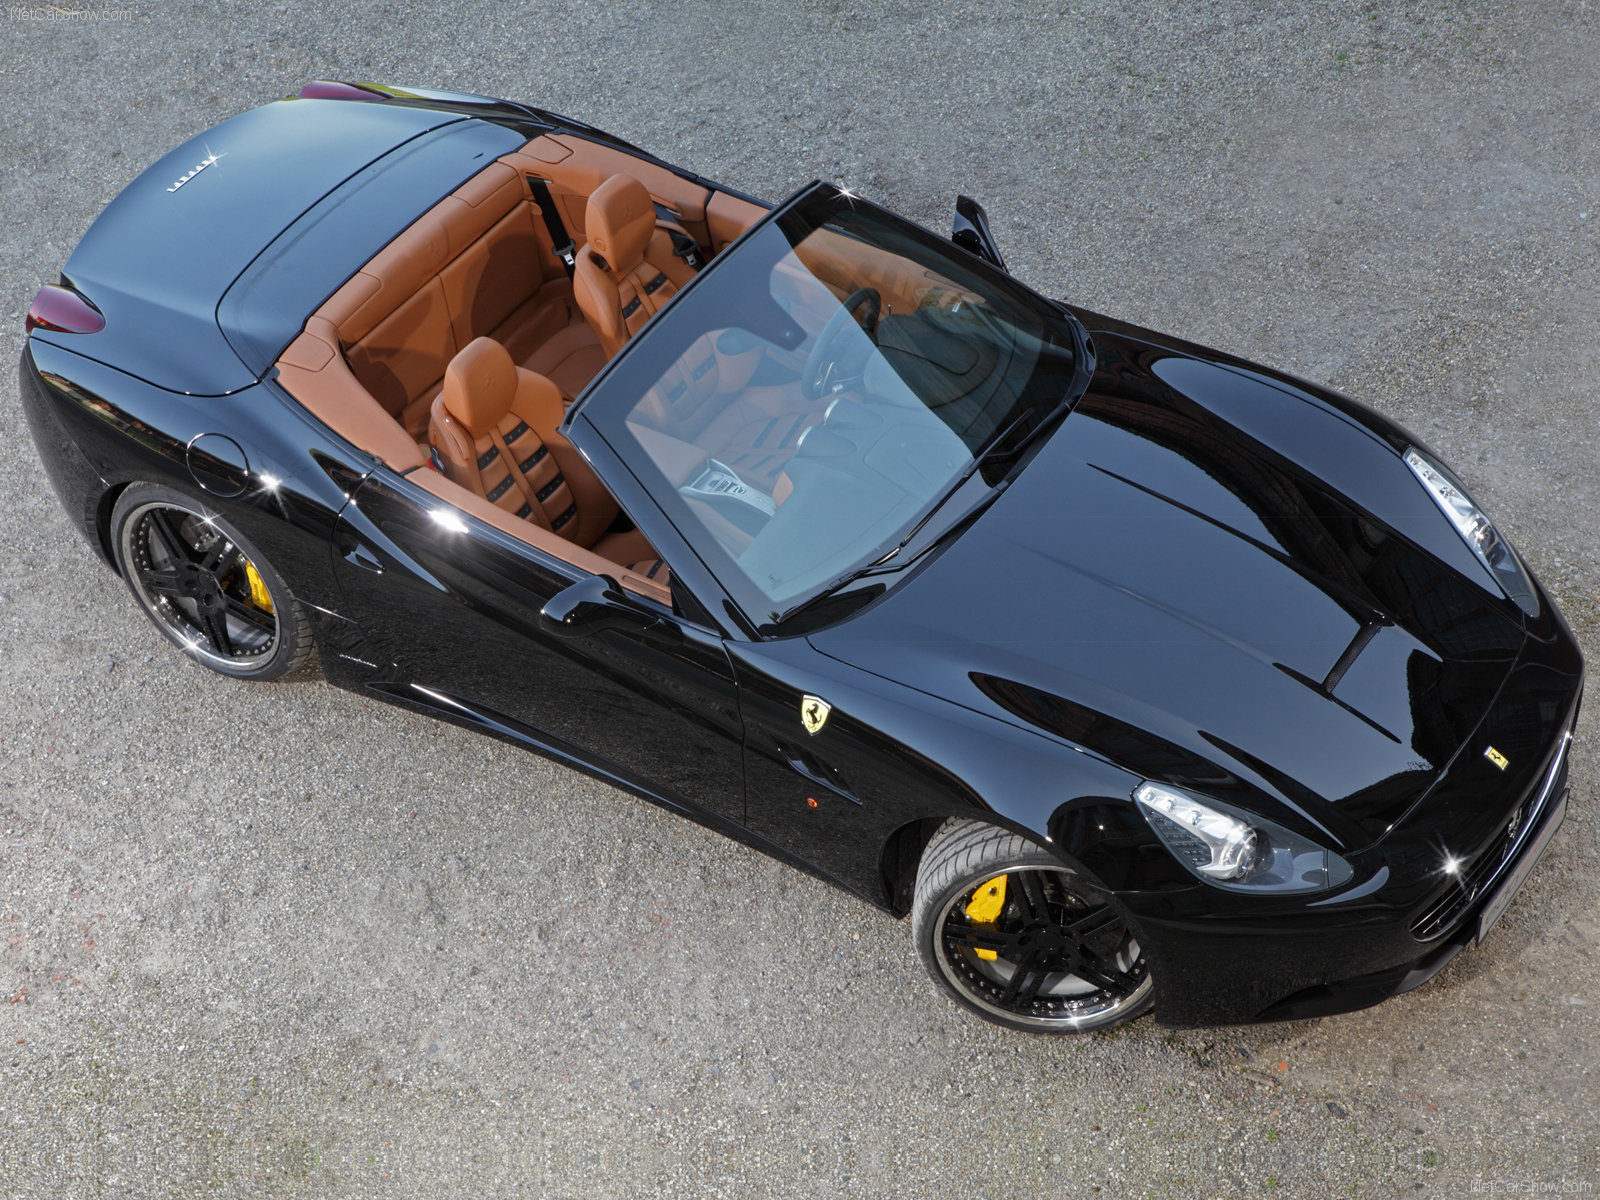 Hình ảnh siêu xe Edo Ferrari California 2009 & nội ngoại thất